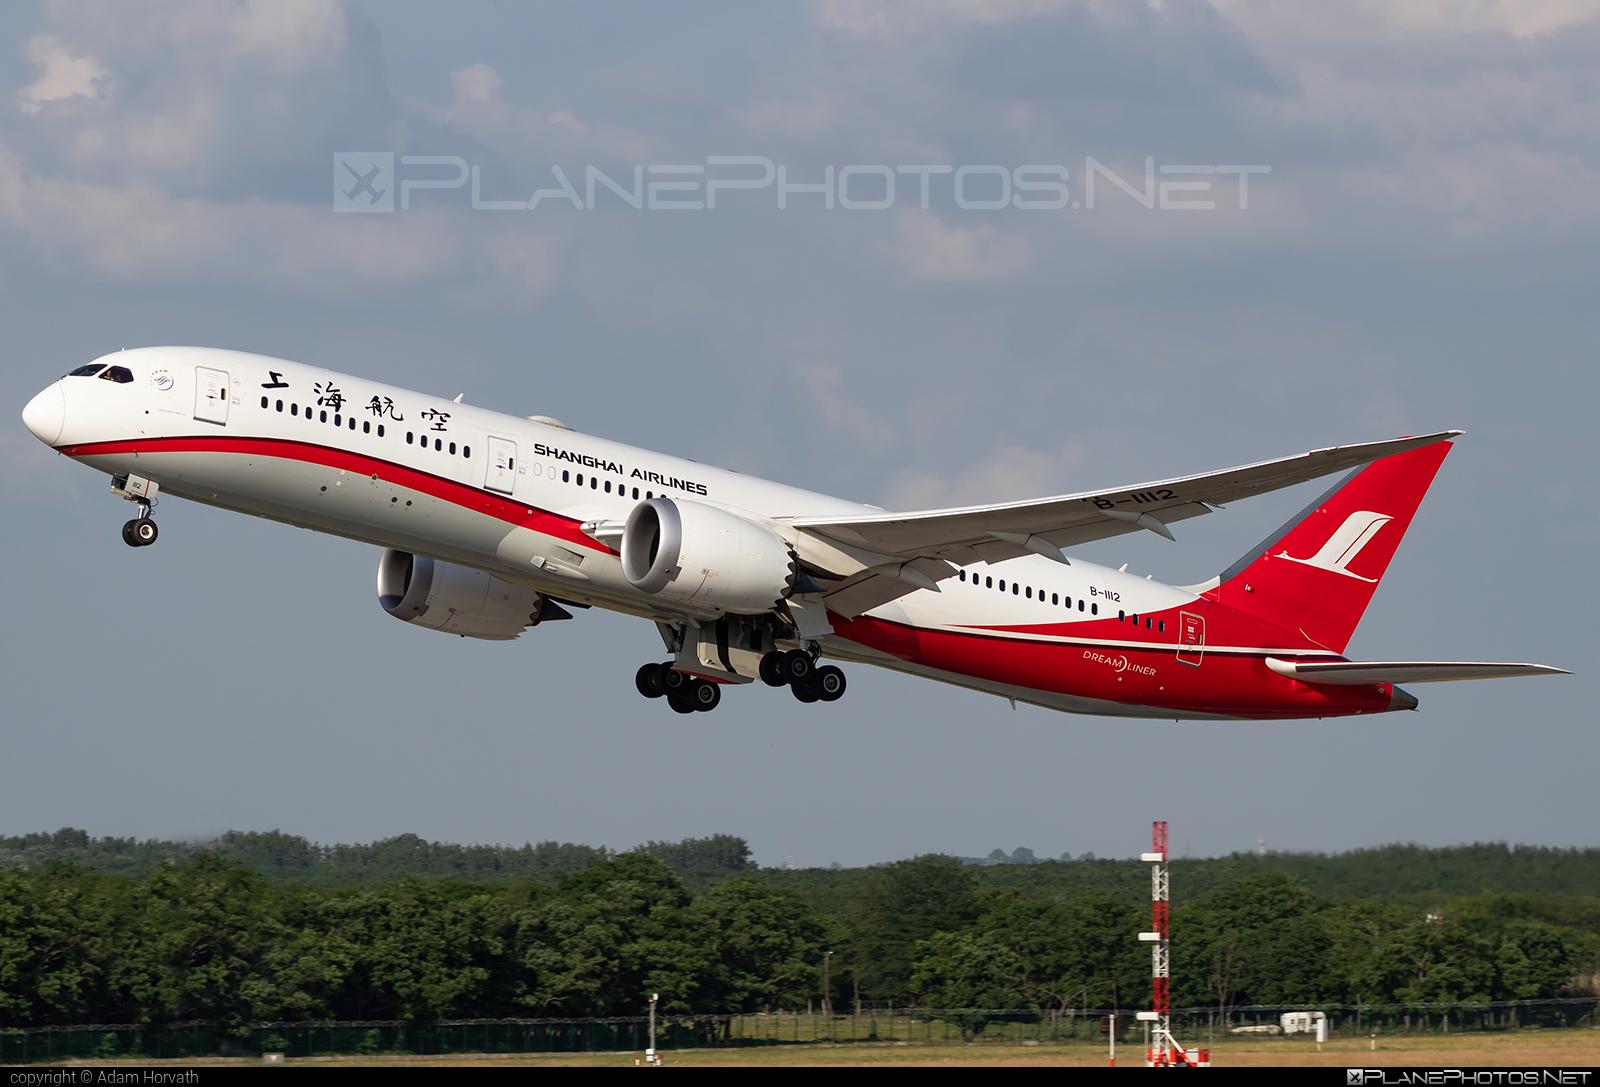 Boeing 787-9 Dreamliner - B-1112 operated by Shanghai Airlines #b787 #boeing #boeing787 #dreamliner